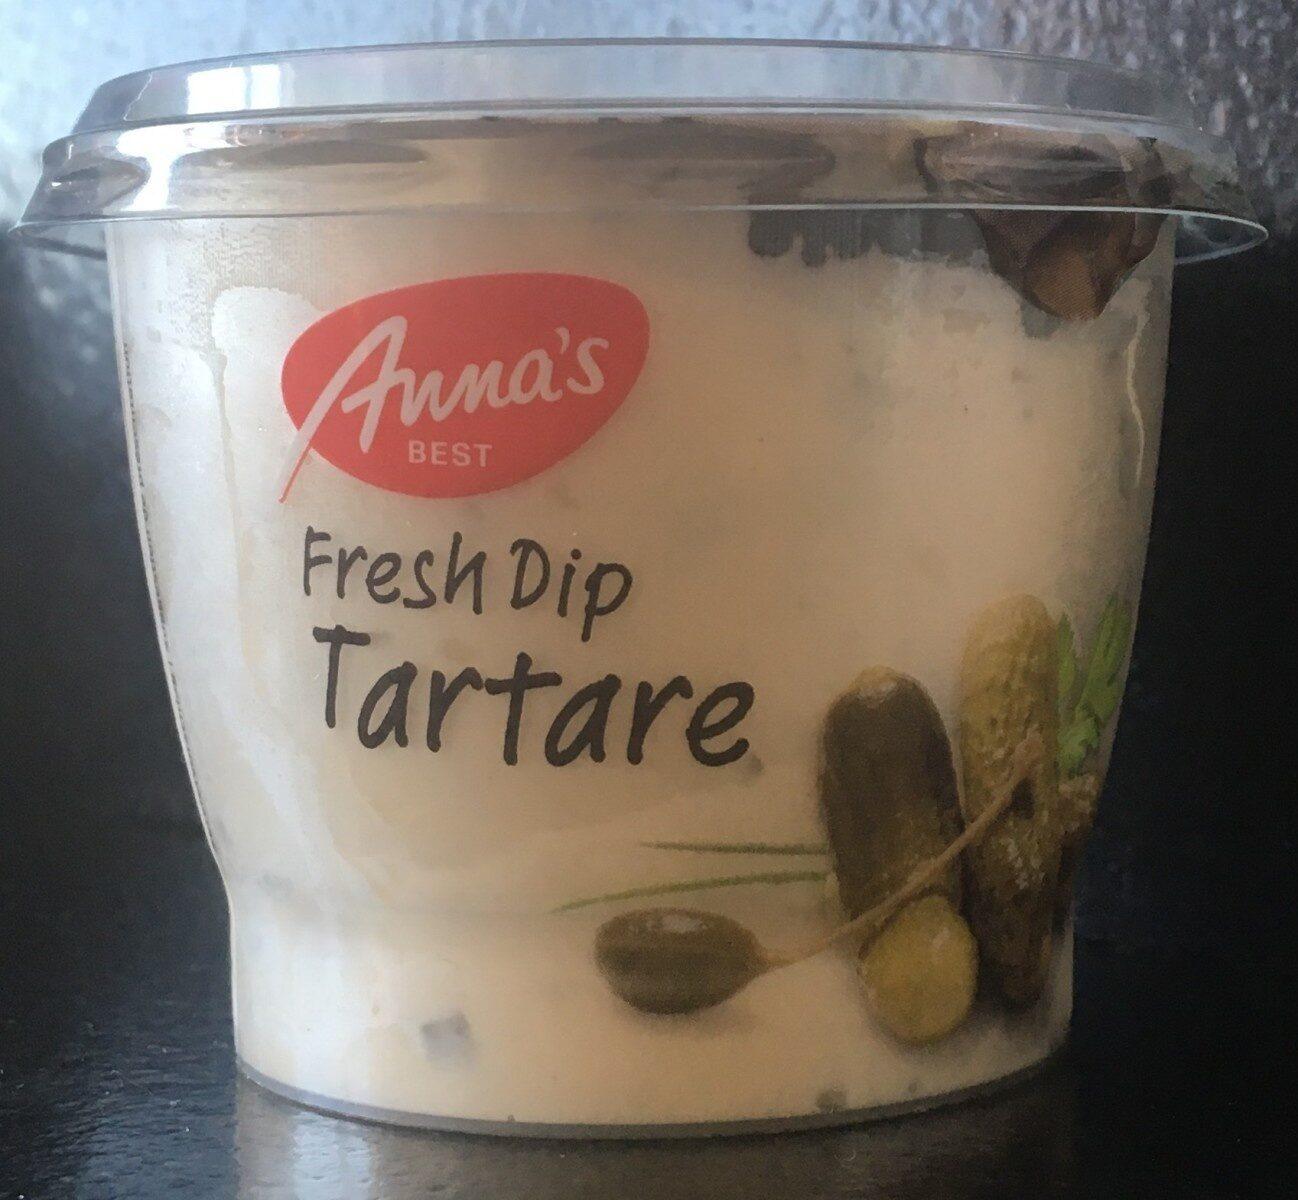 Fresh Dip Tartare - Product - fr